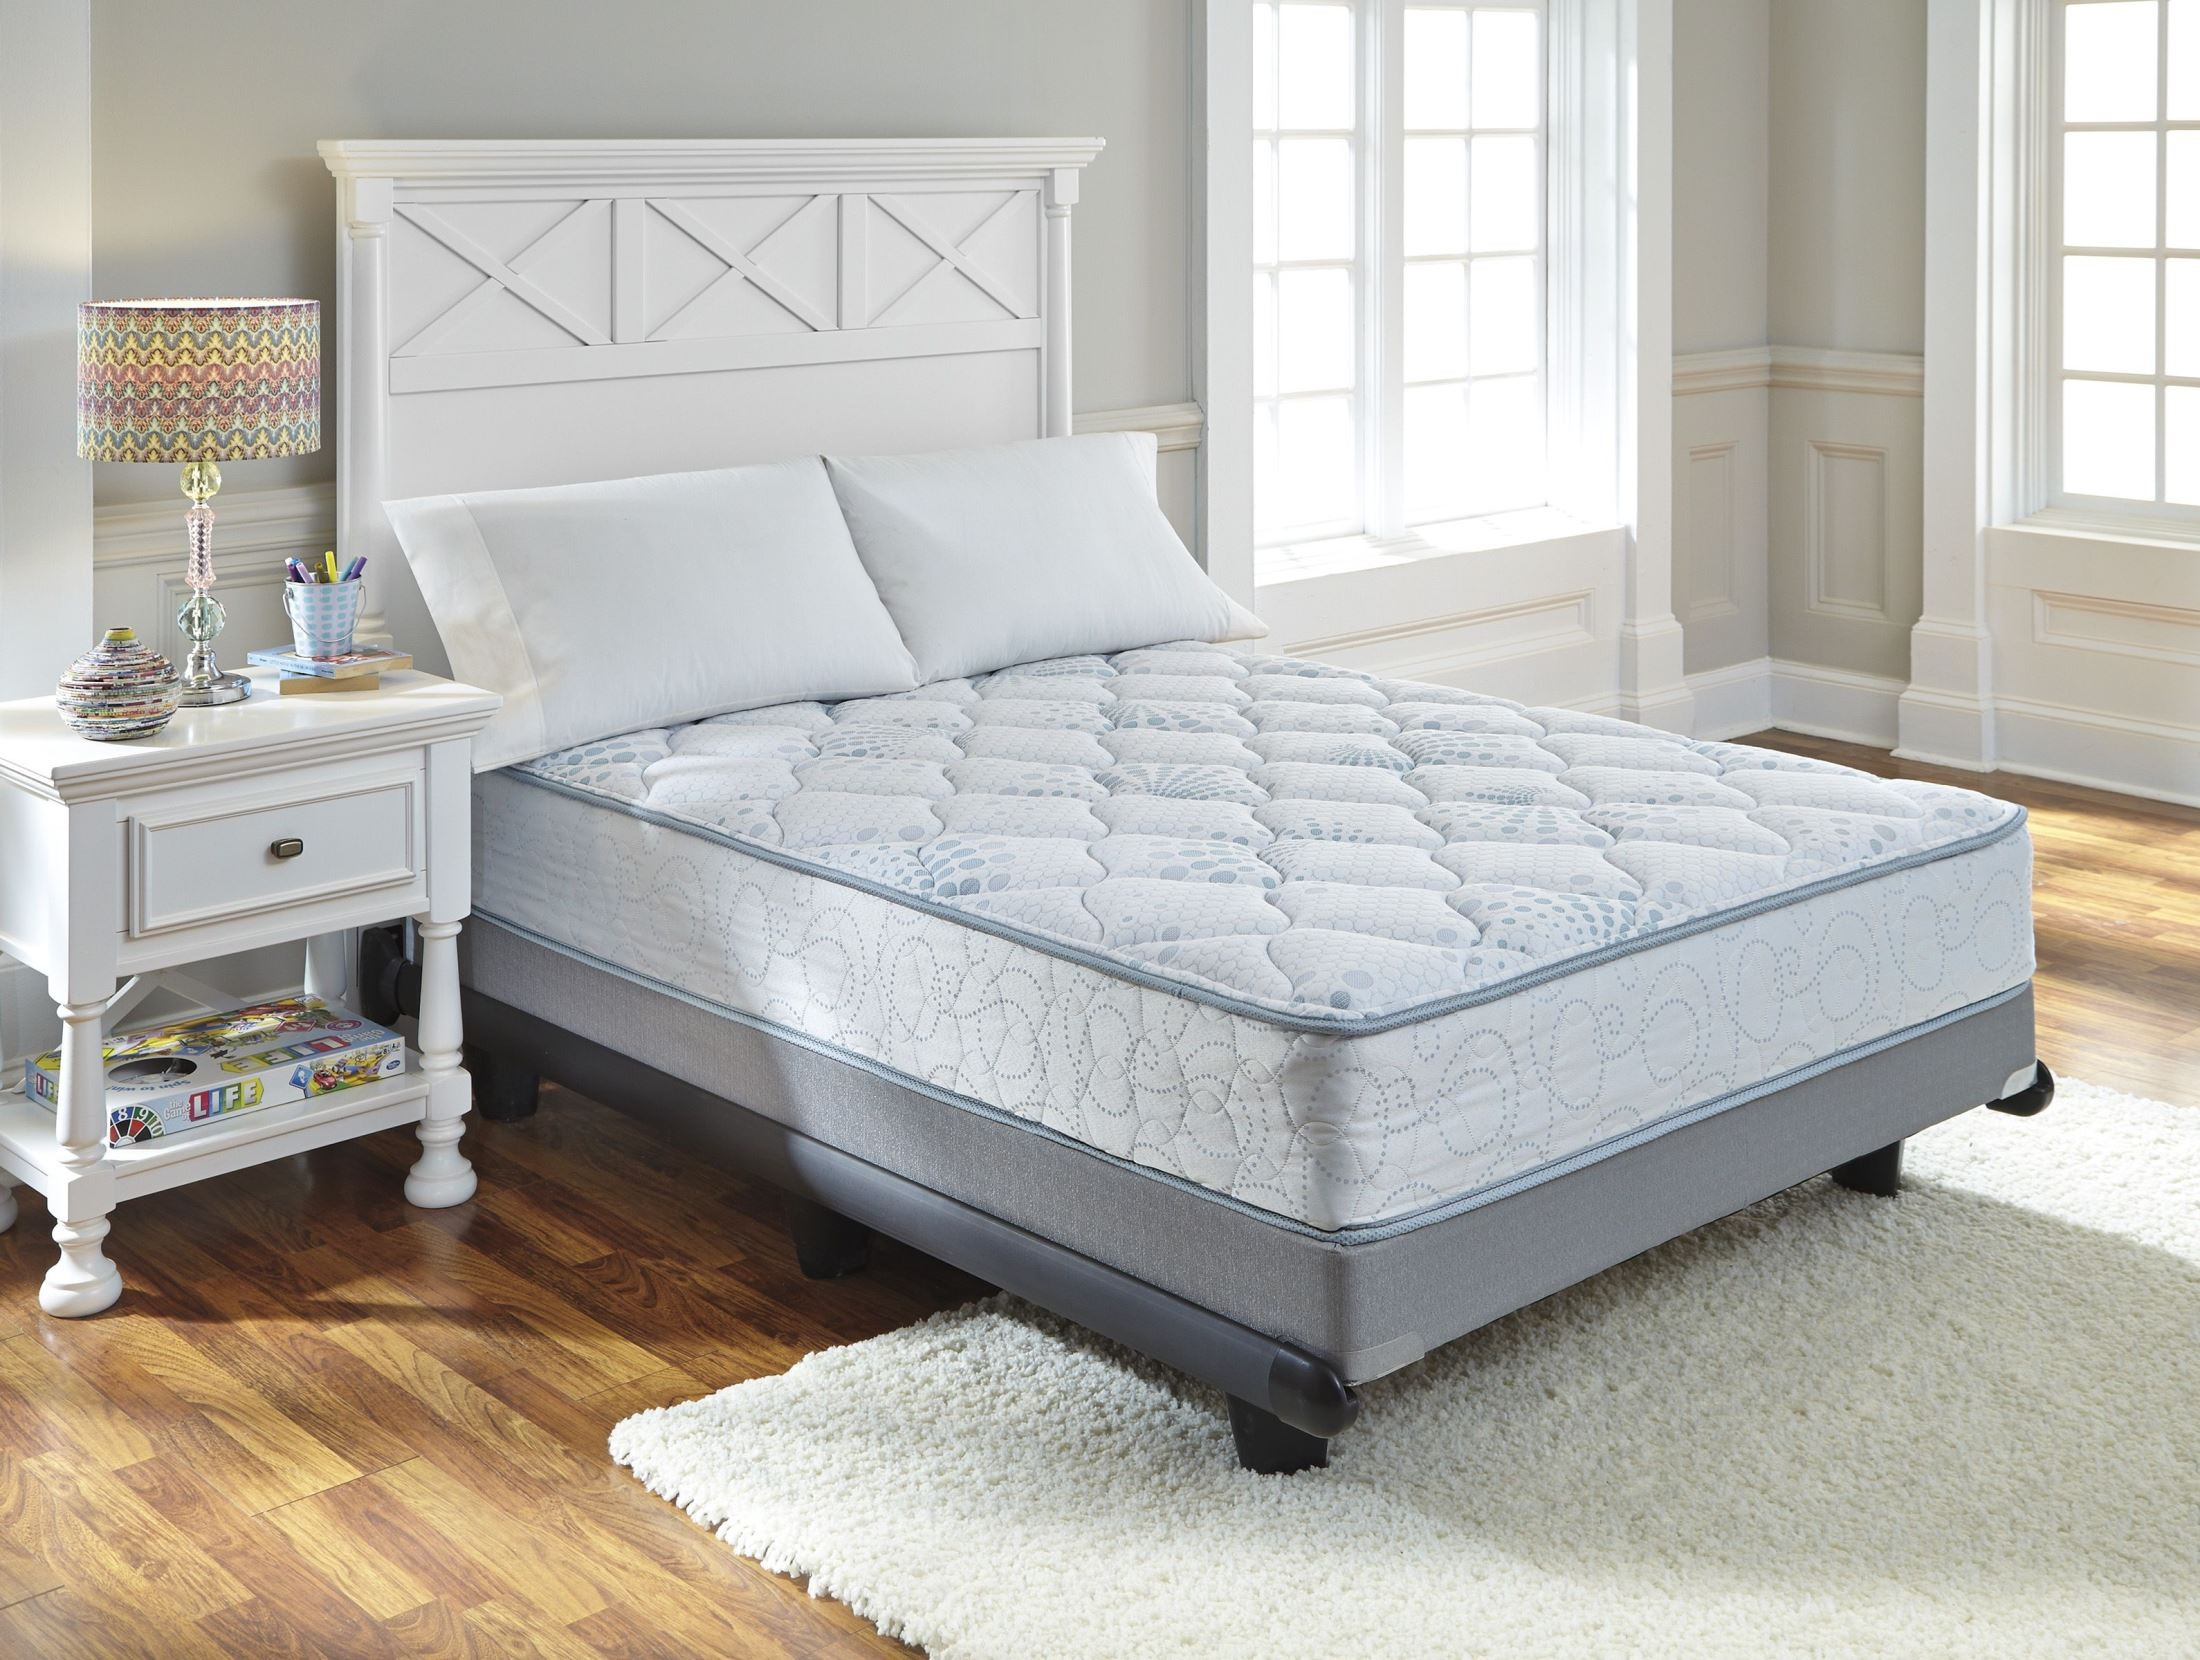 kids bedding innerspring full size mattress m80421 ashley. Black Bedroom Furniture Sets. Home Design Ideas